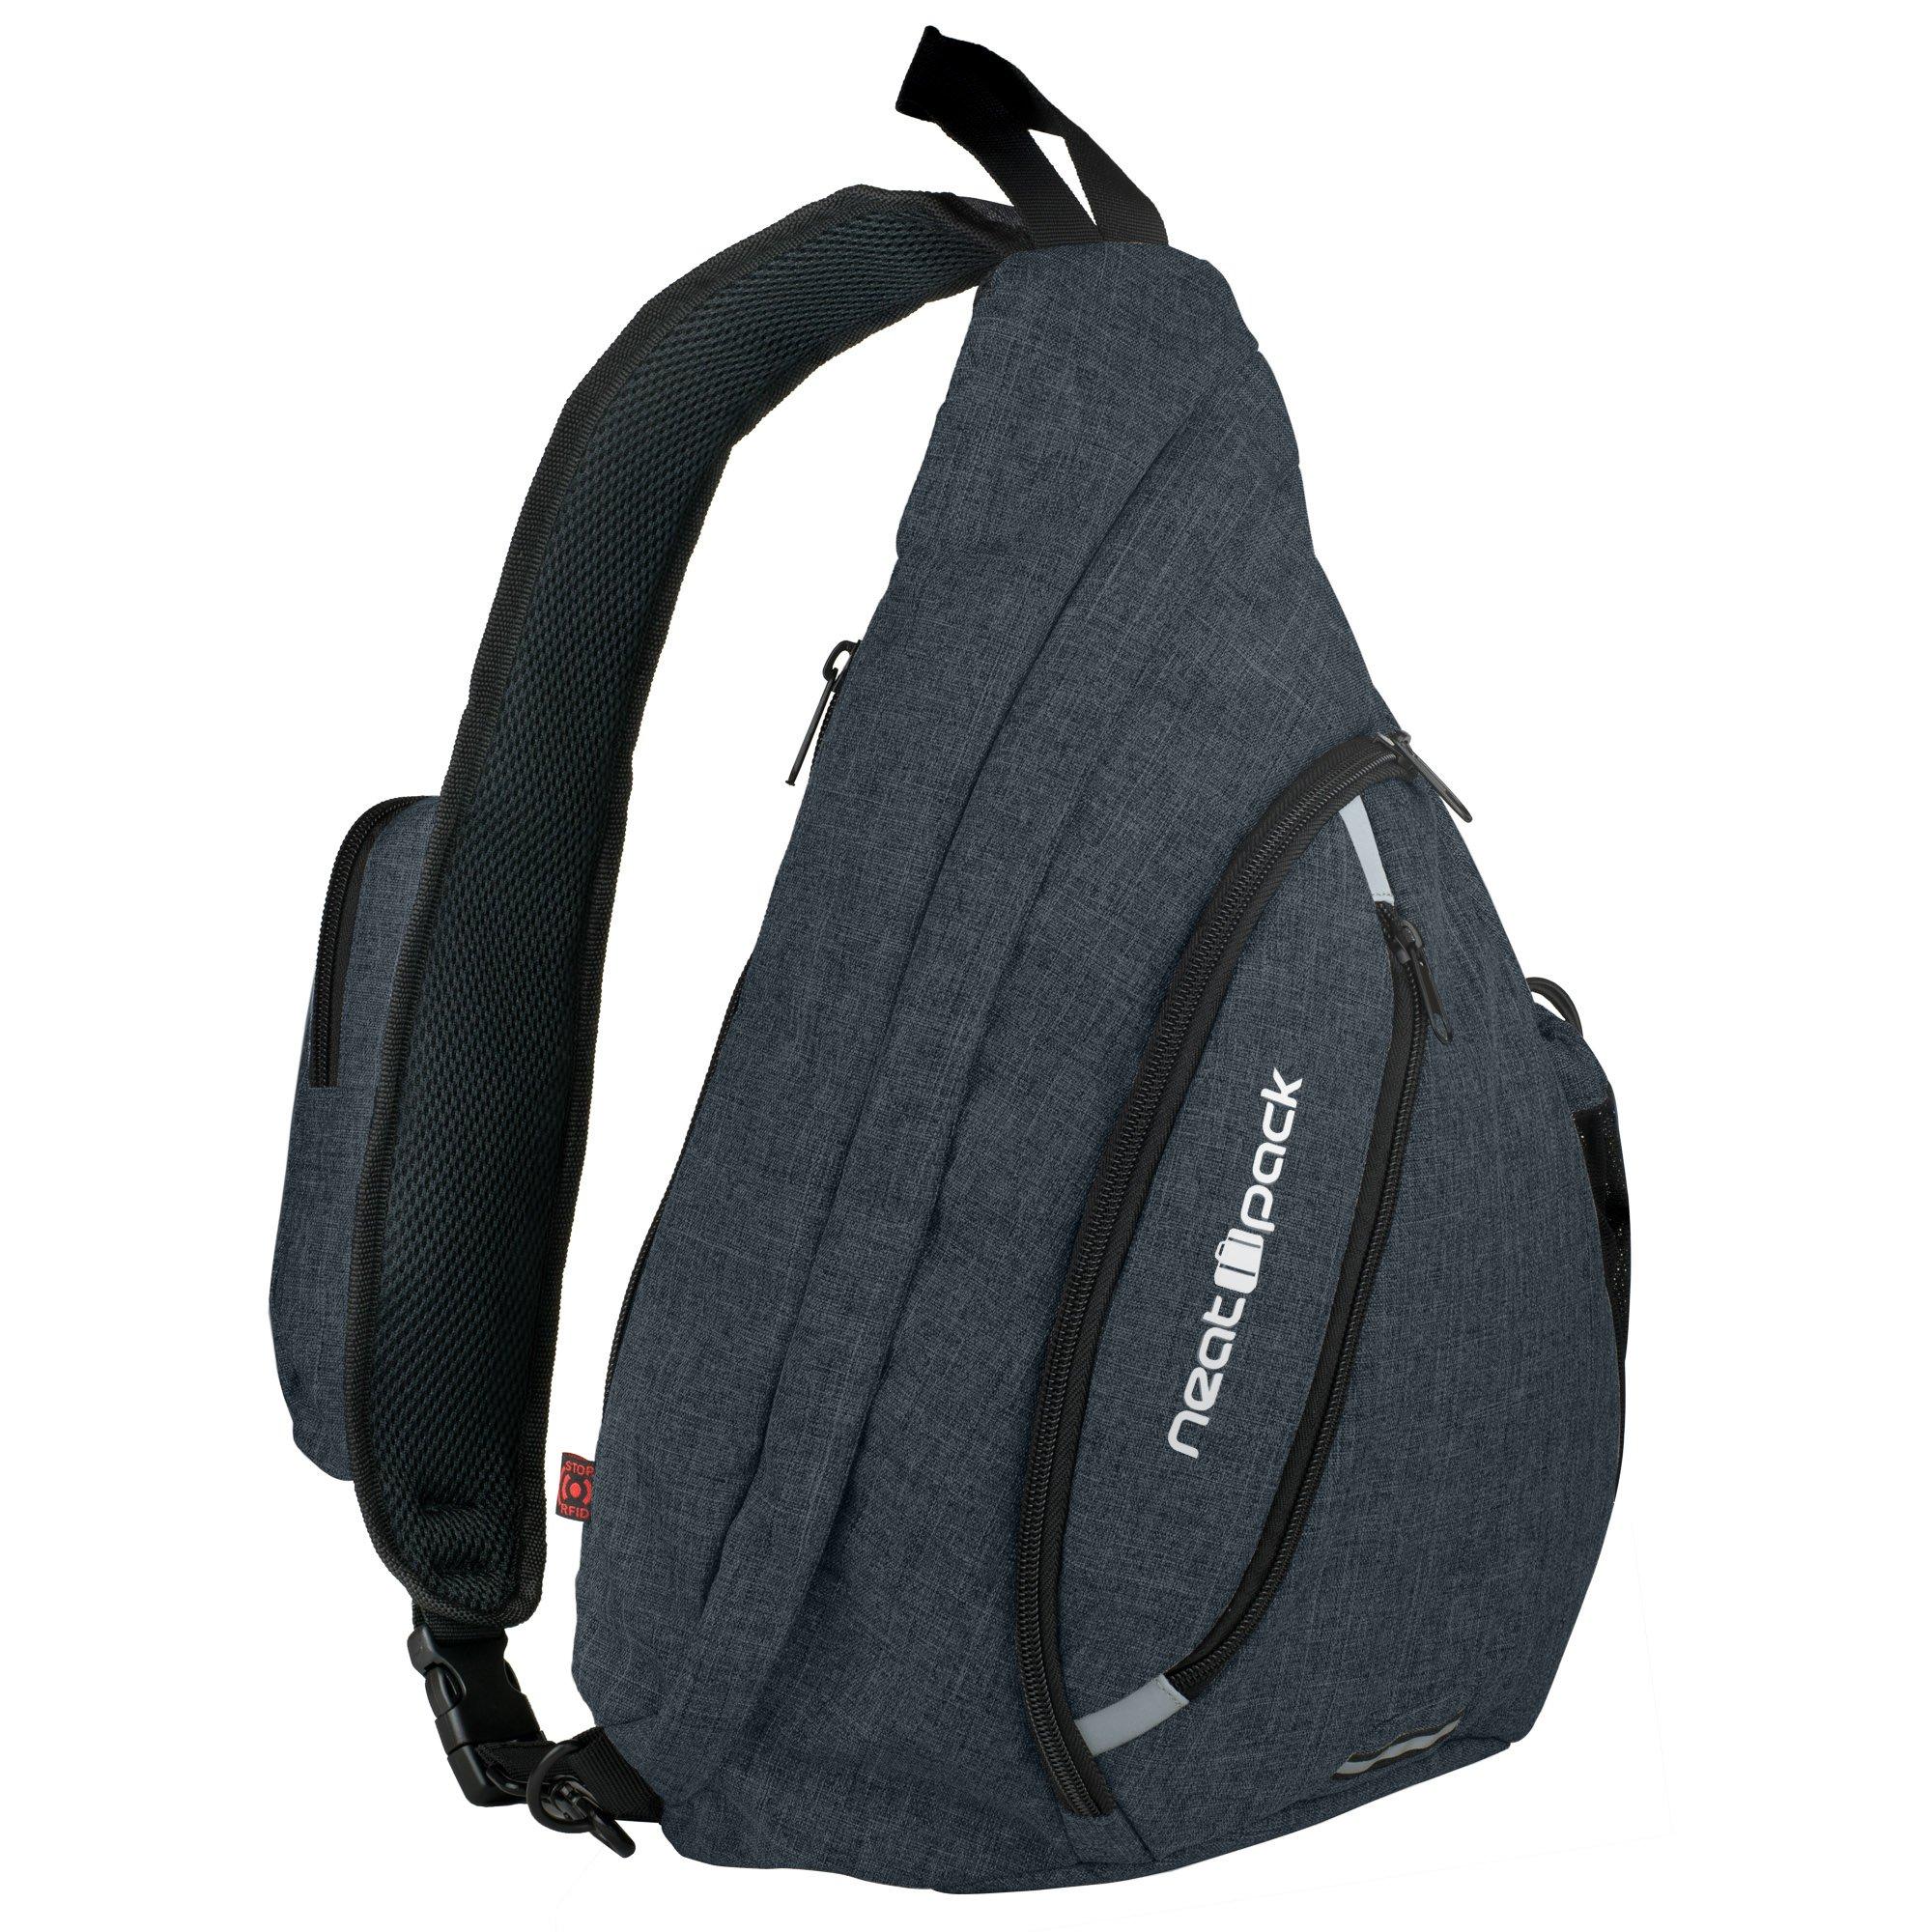 Versatile Canvas Sling Bag/Urban Travel Backpack, Black | Wear Over Shoulder or Crossbody for Men & Women, by NeatPack by NeatPack